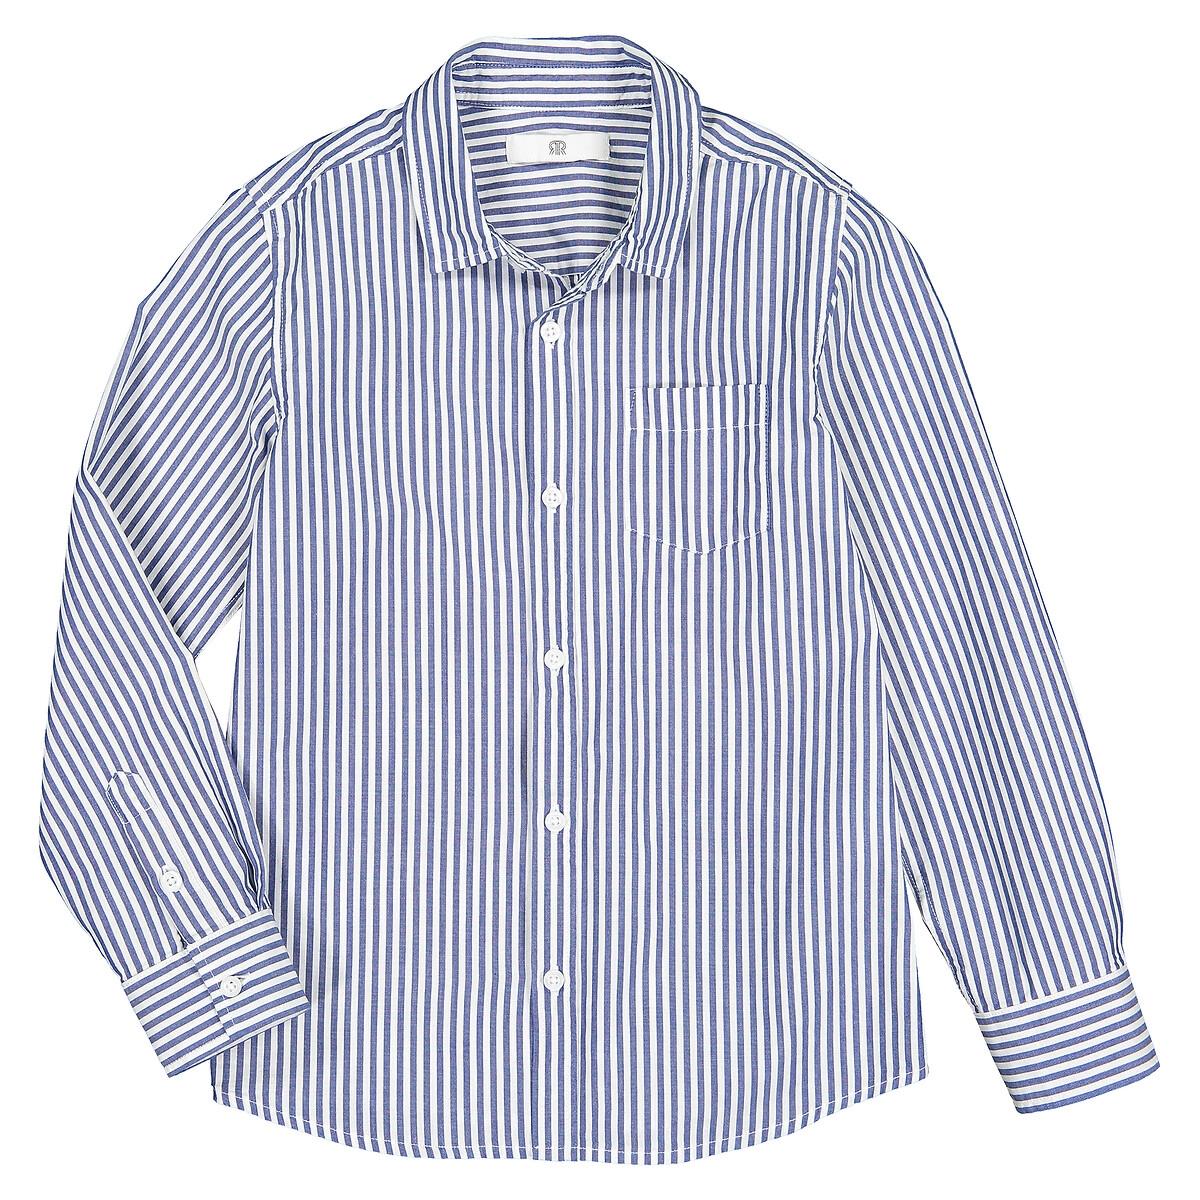 Striped Cotton Shirt 3 12 Years